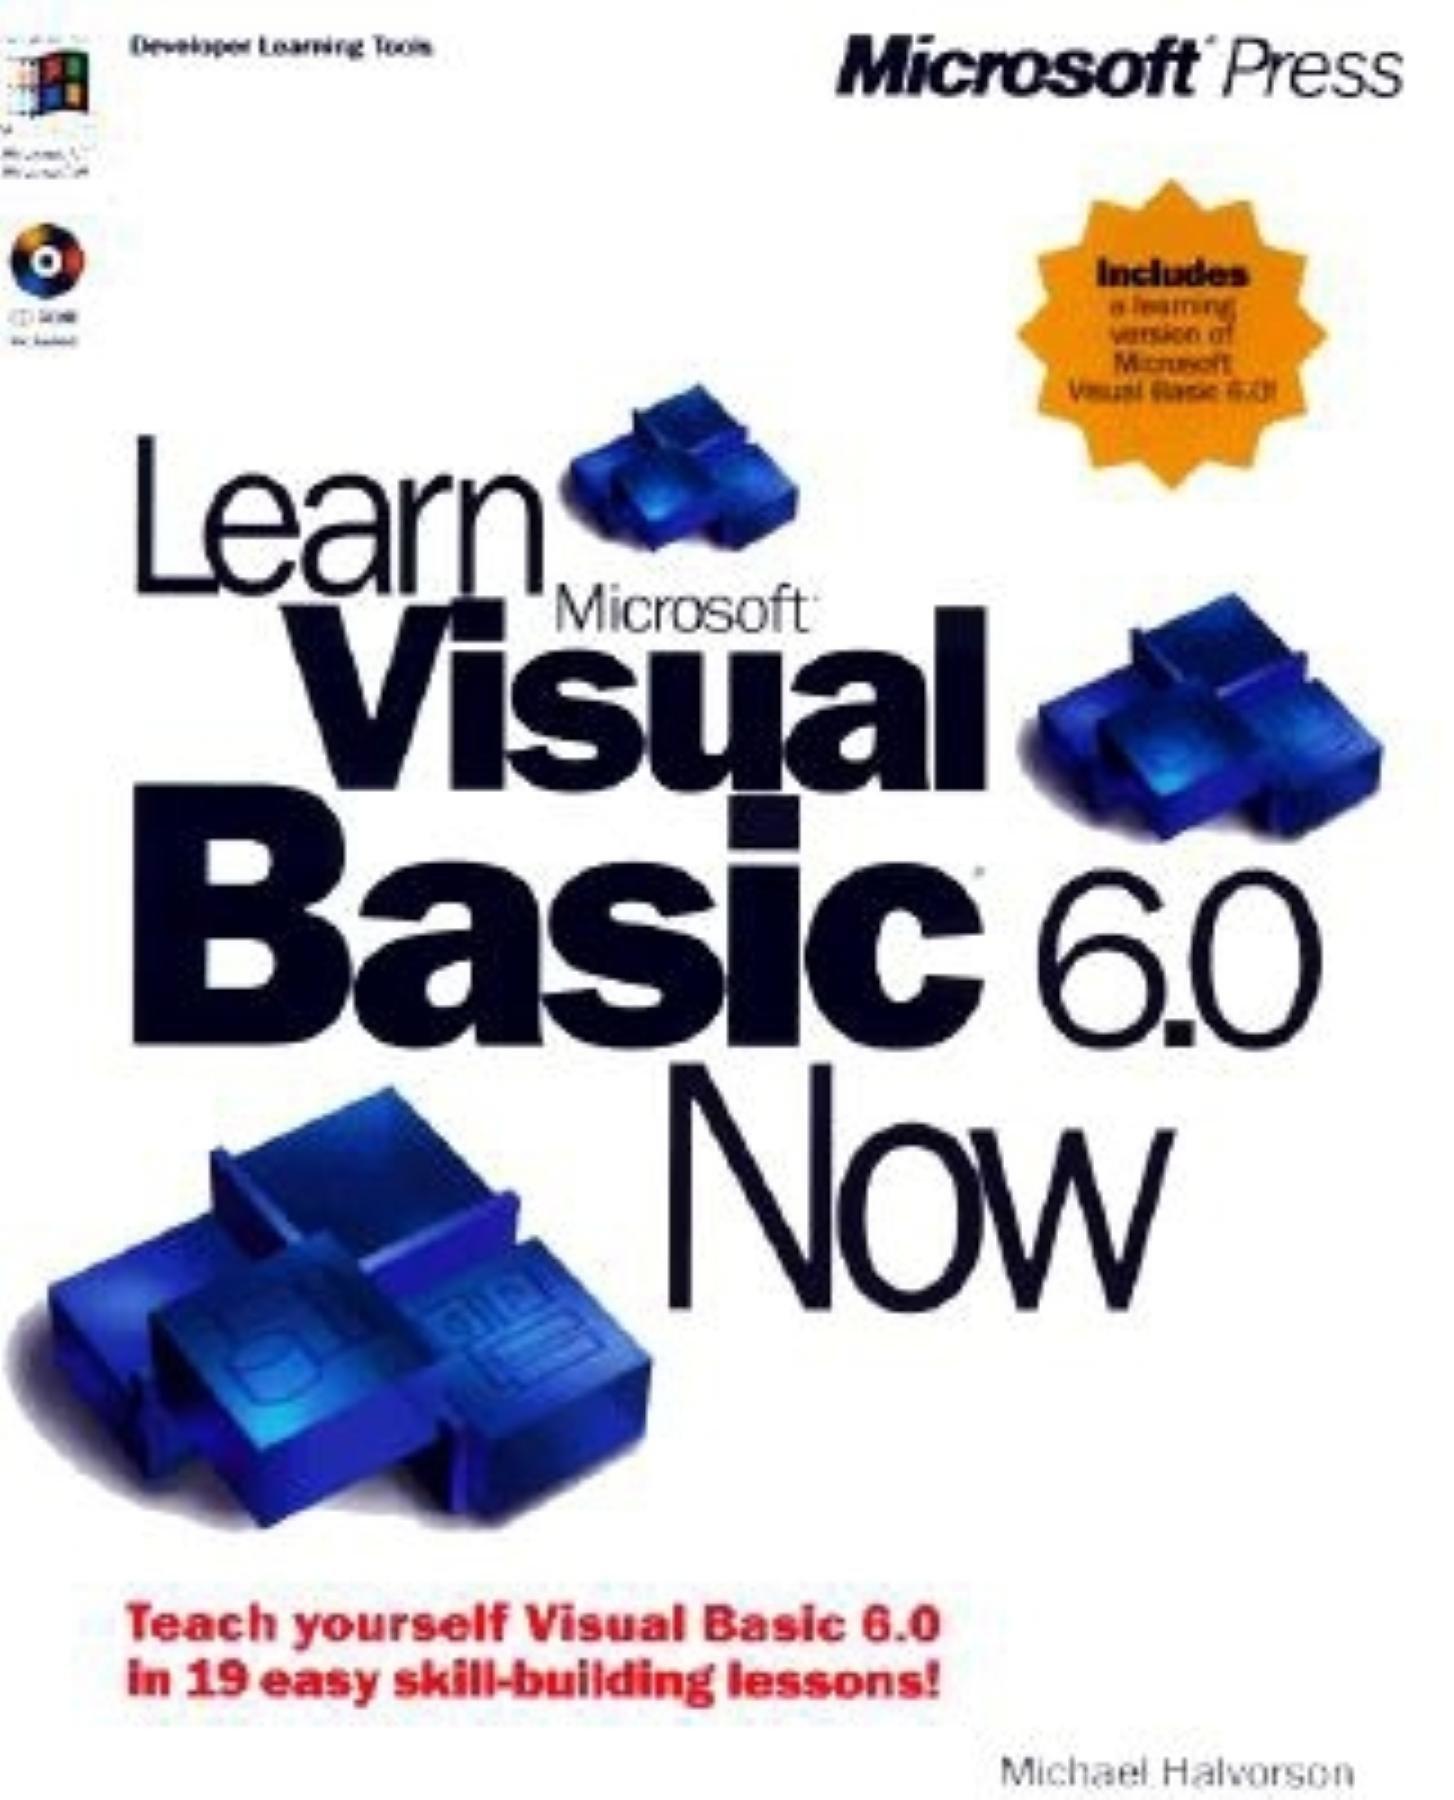 Learn Microsoft Visual Basic 6 0 Now (Learn Now): Michael Halvorson